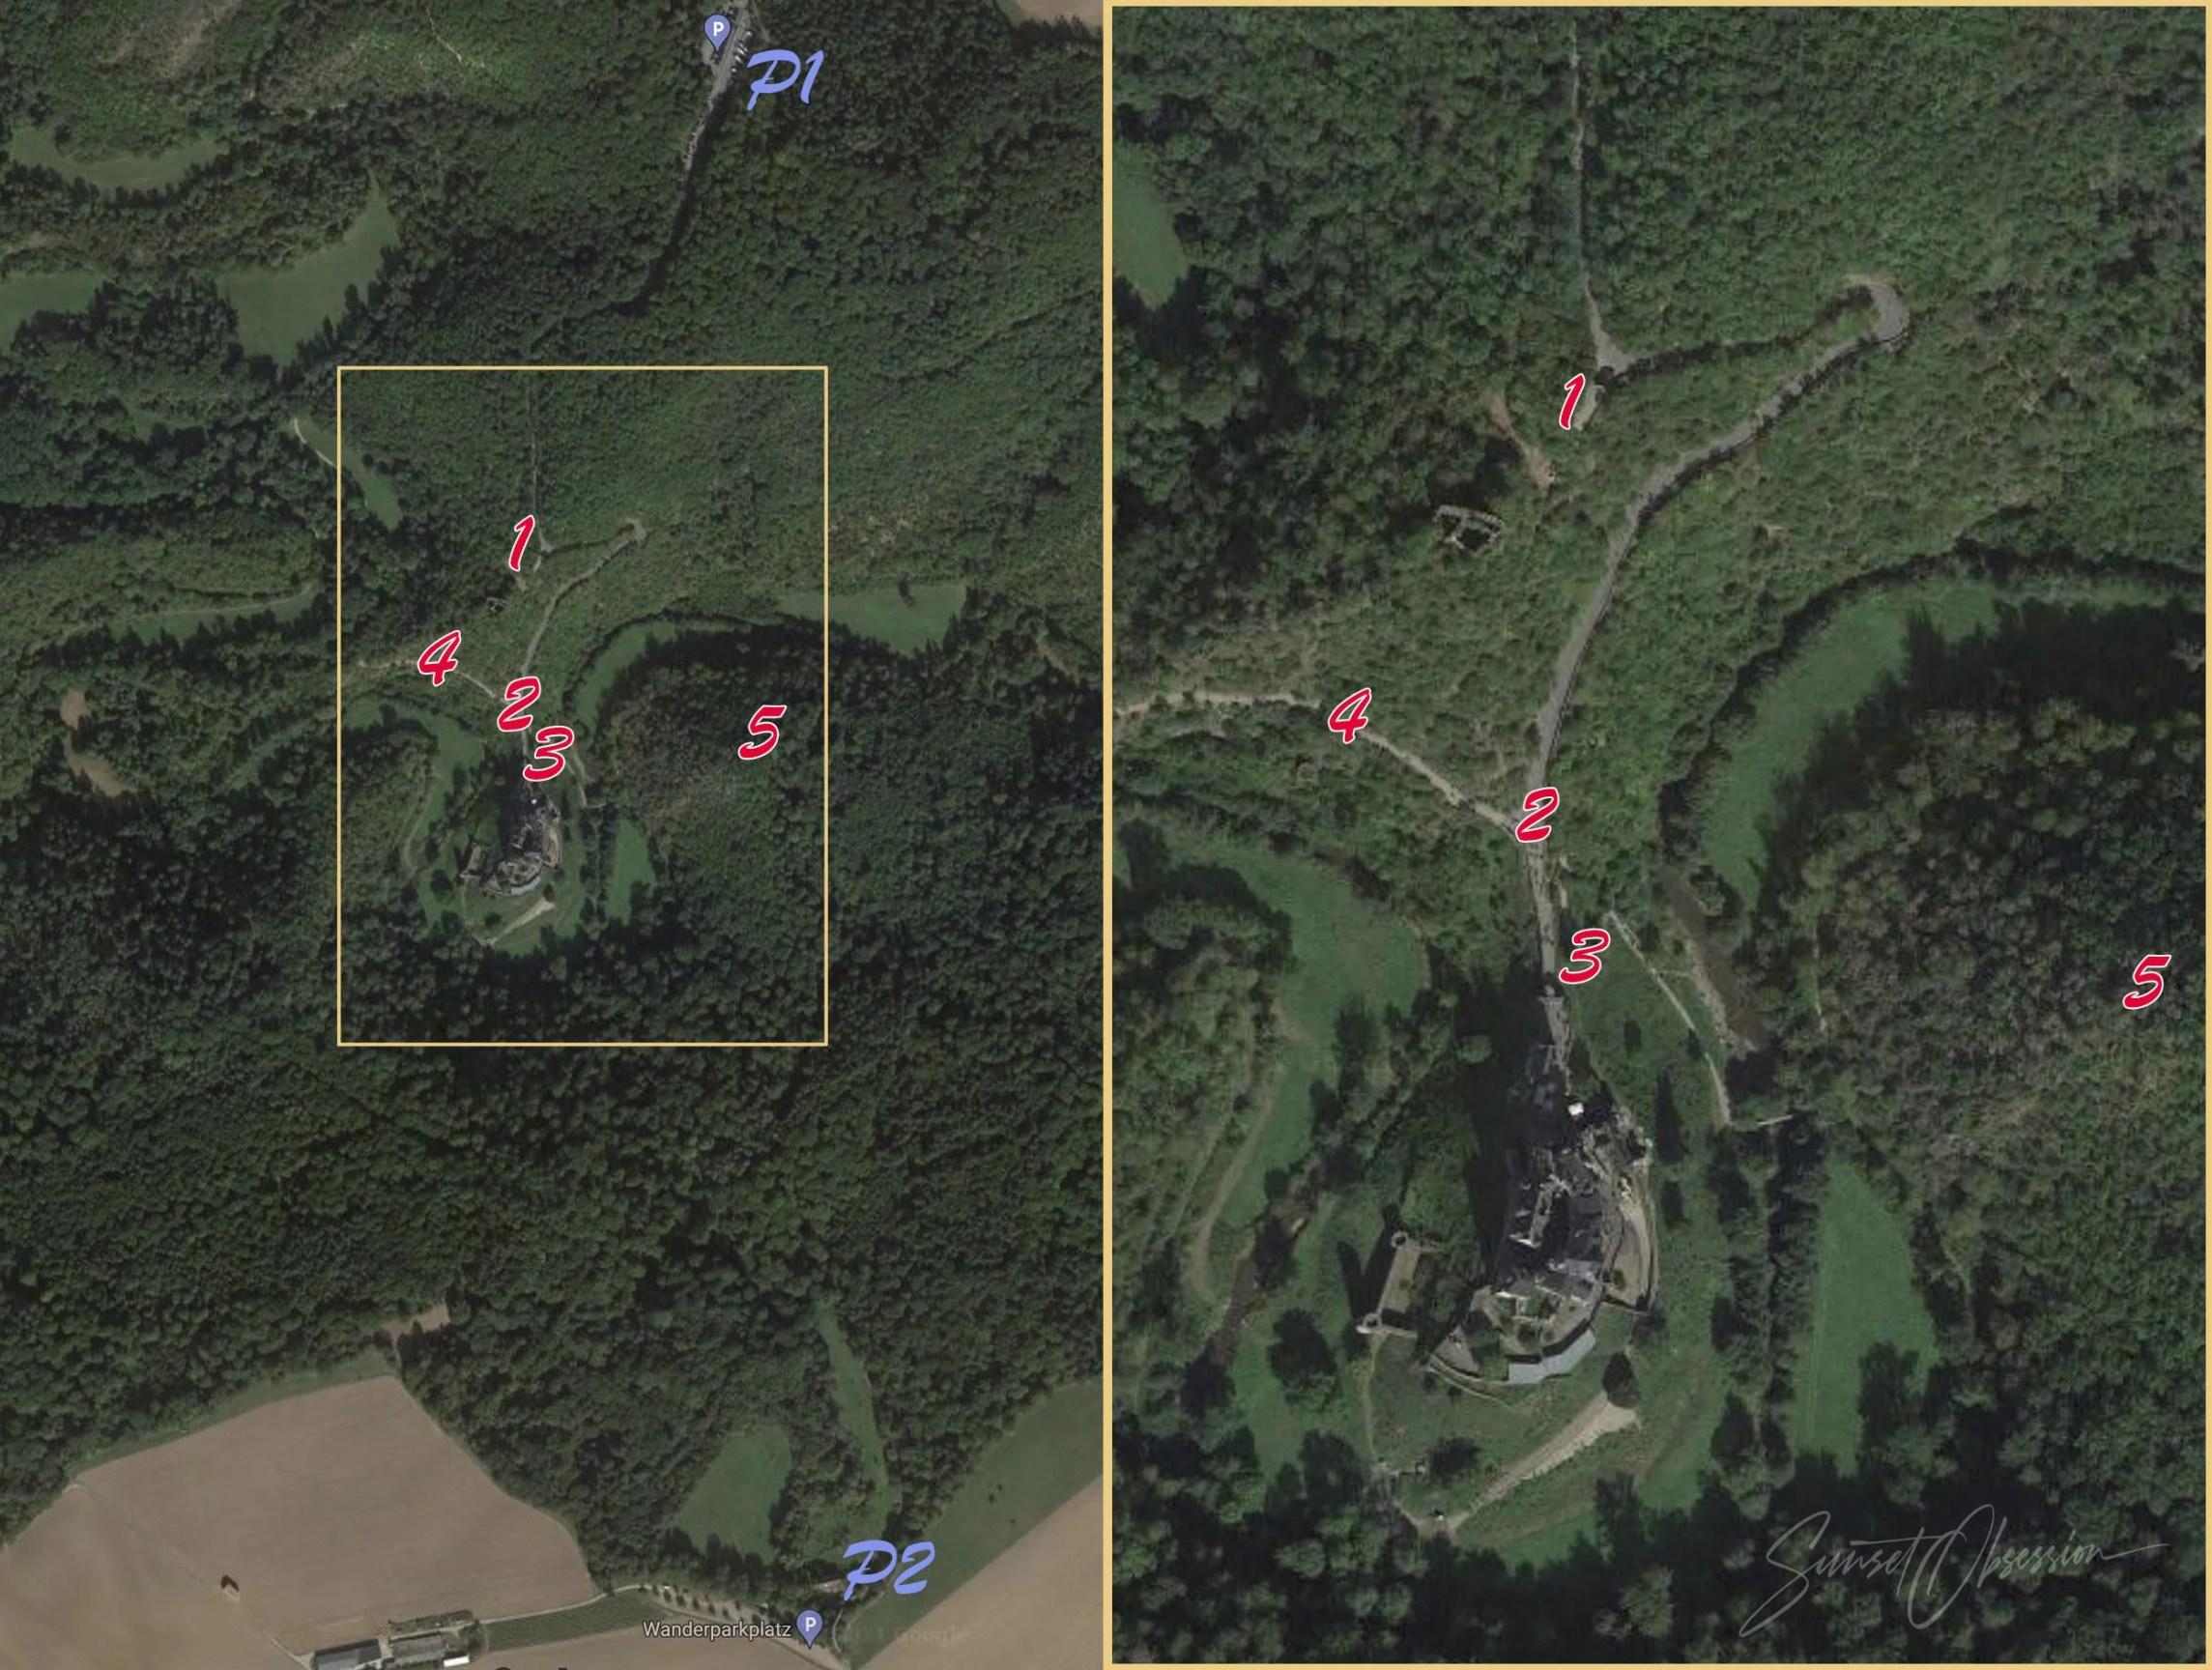 Burg Eltz photography location map